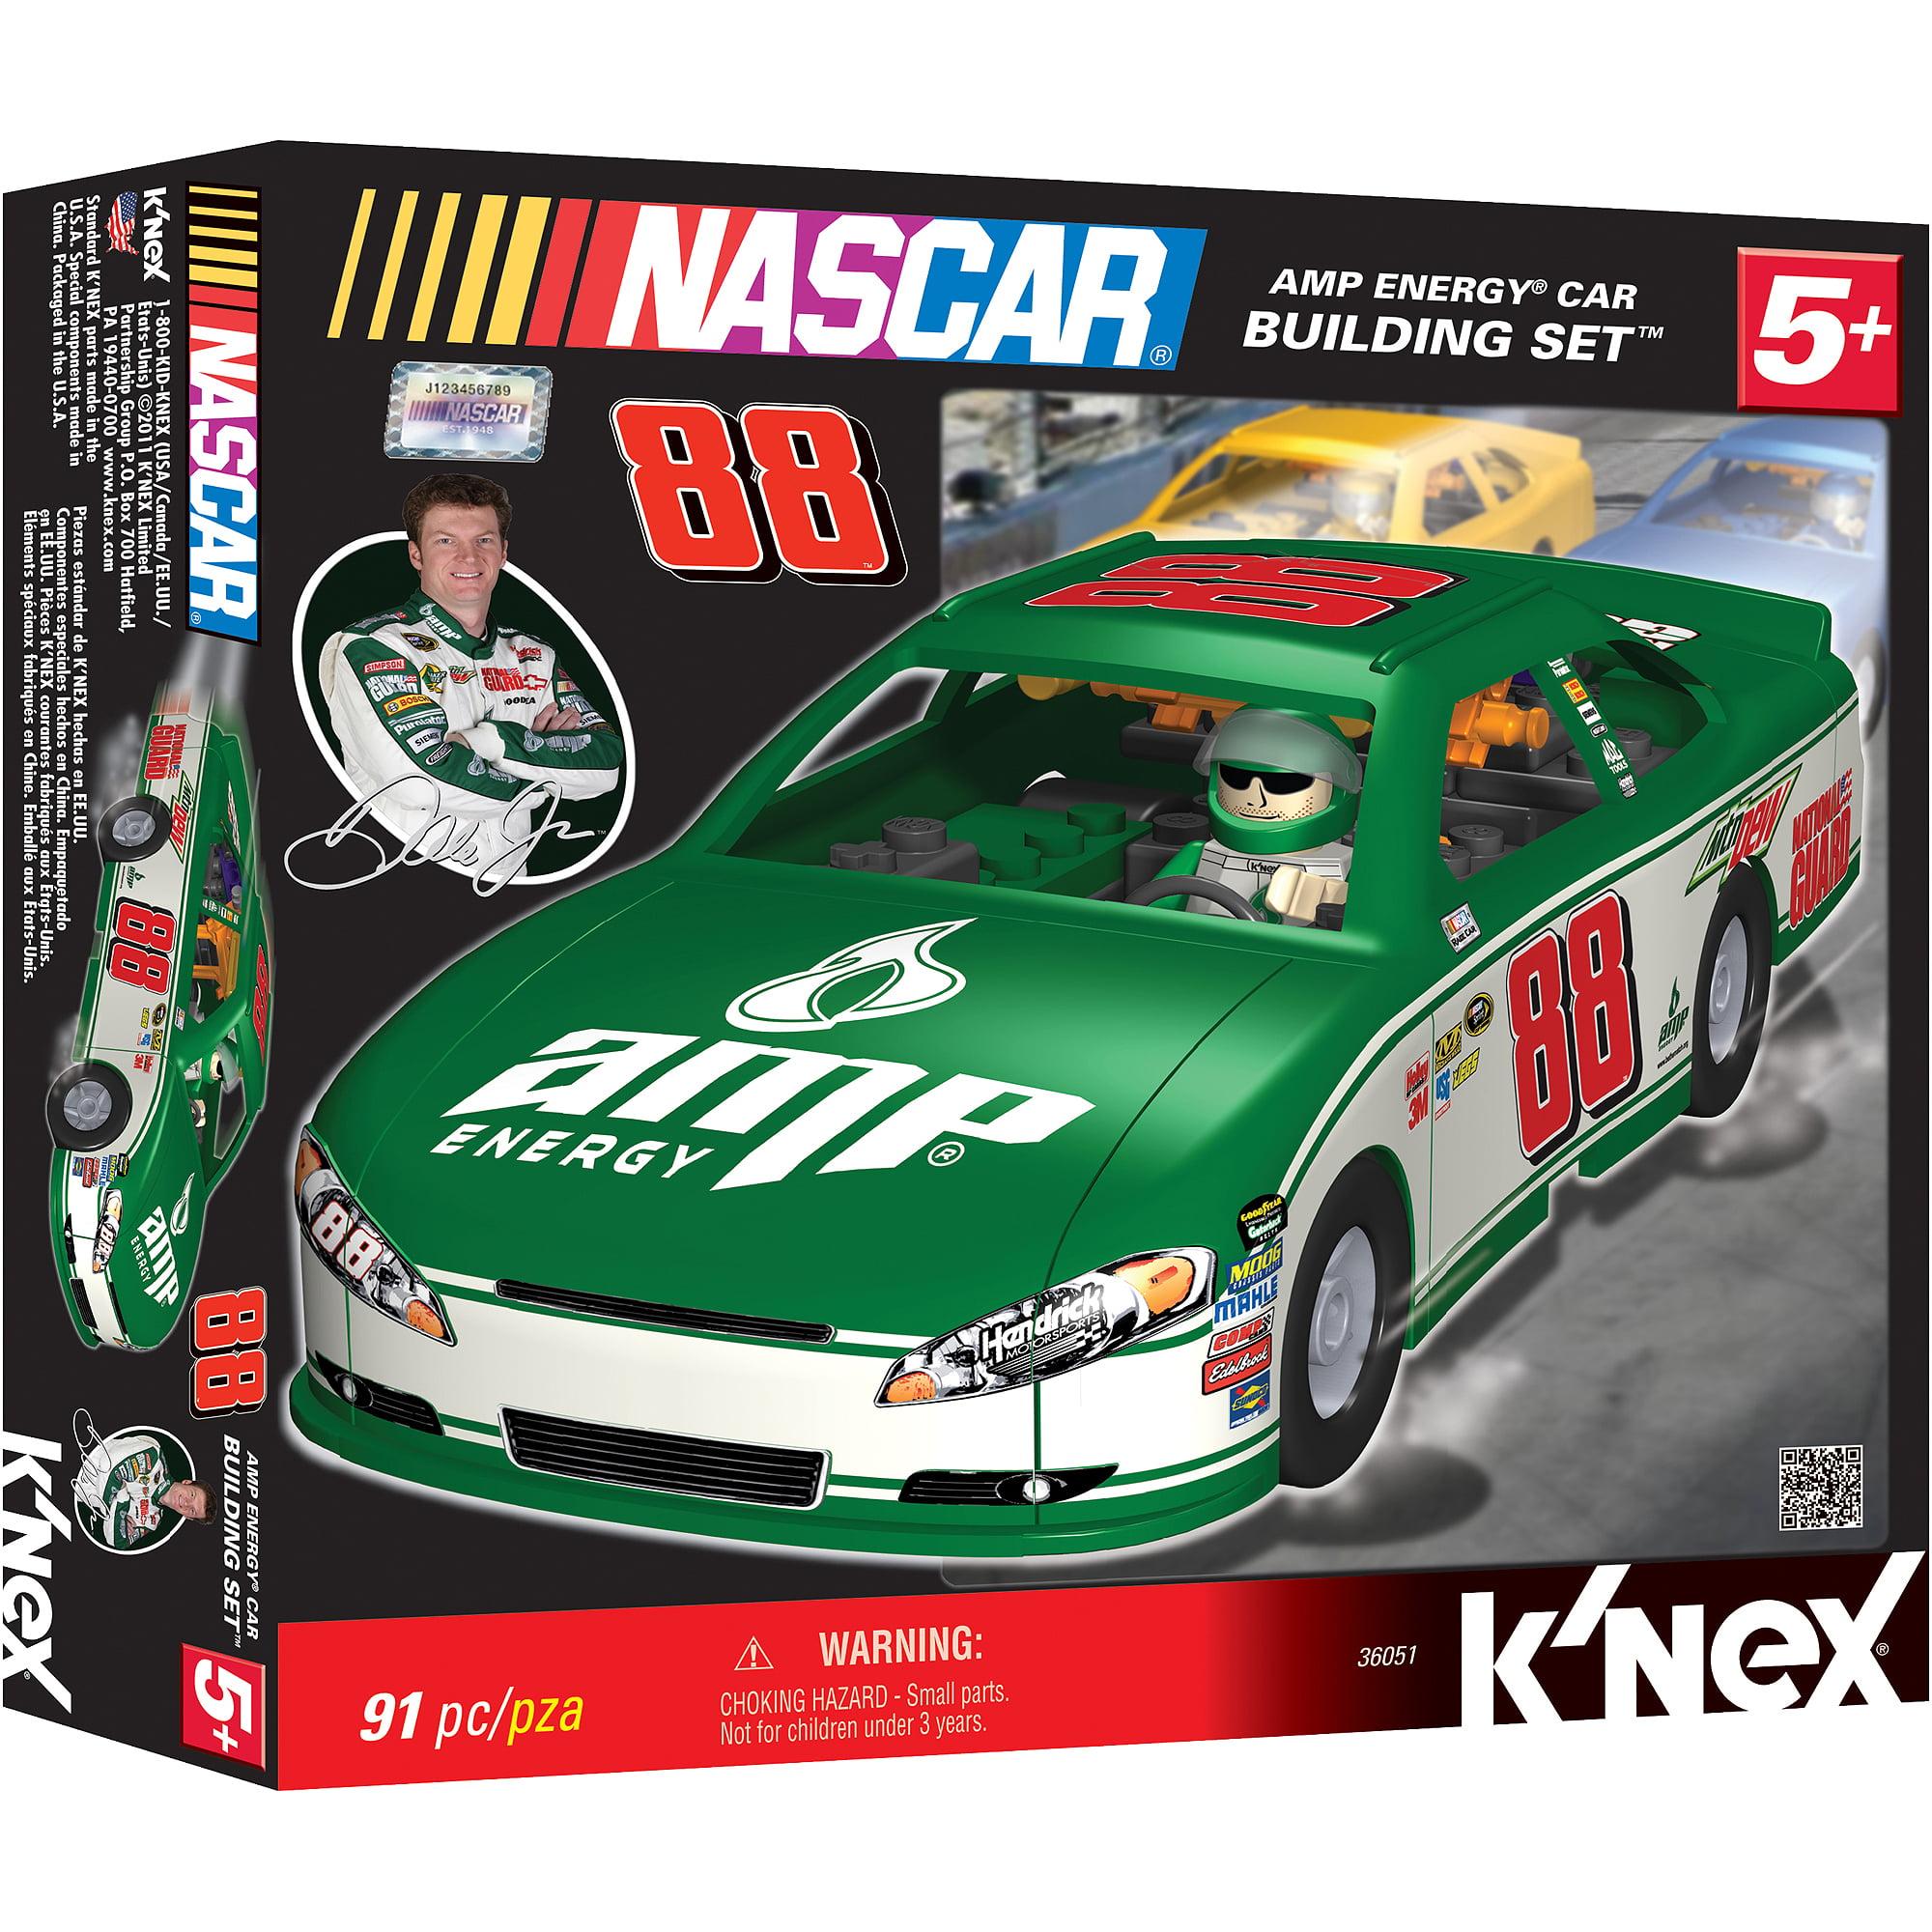 K'NEX Nascar Building Set: Dale Earnhardt Jr.'s #88 Amp Energy Car